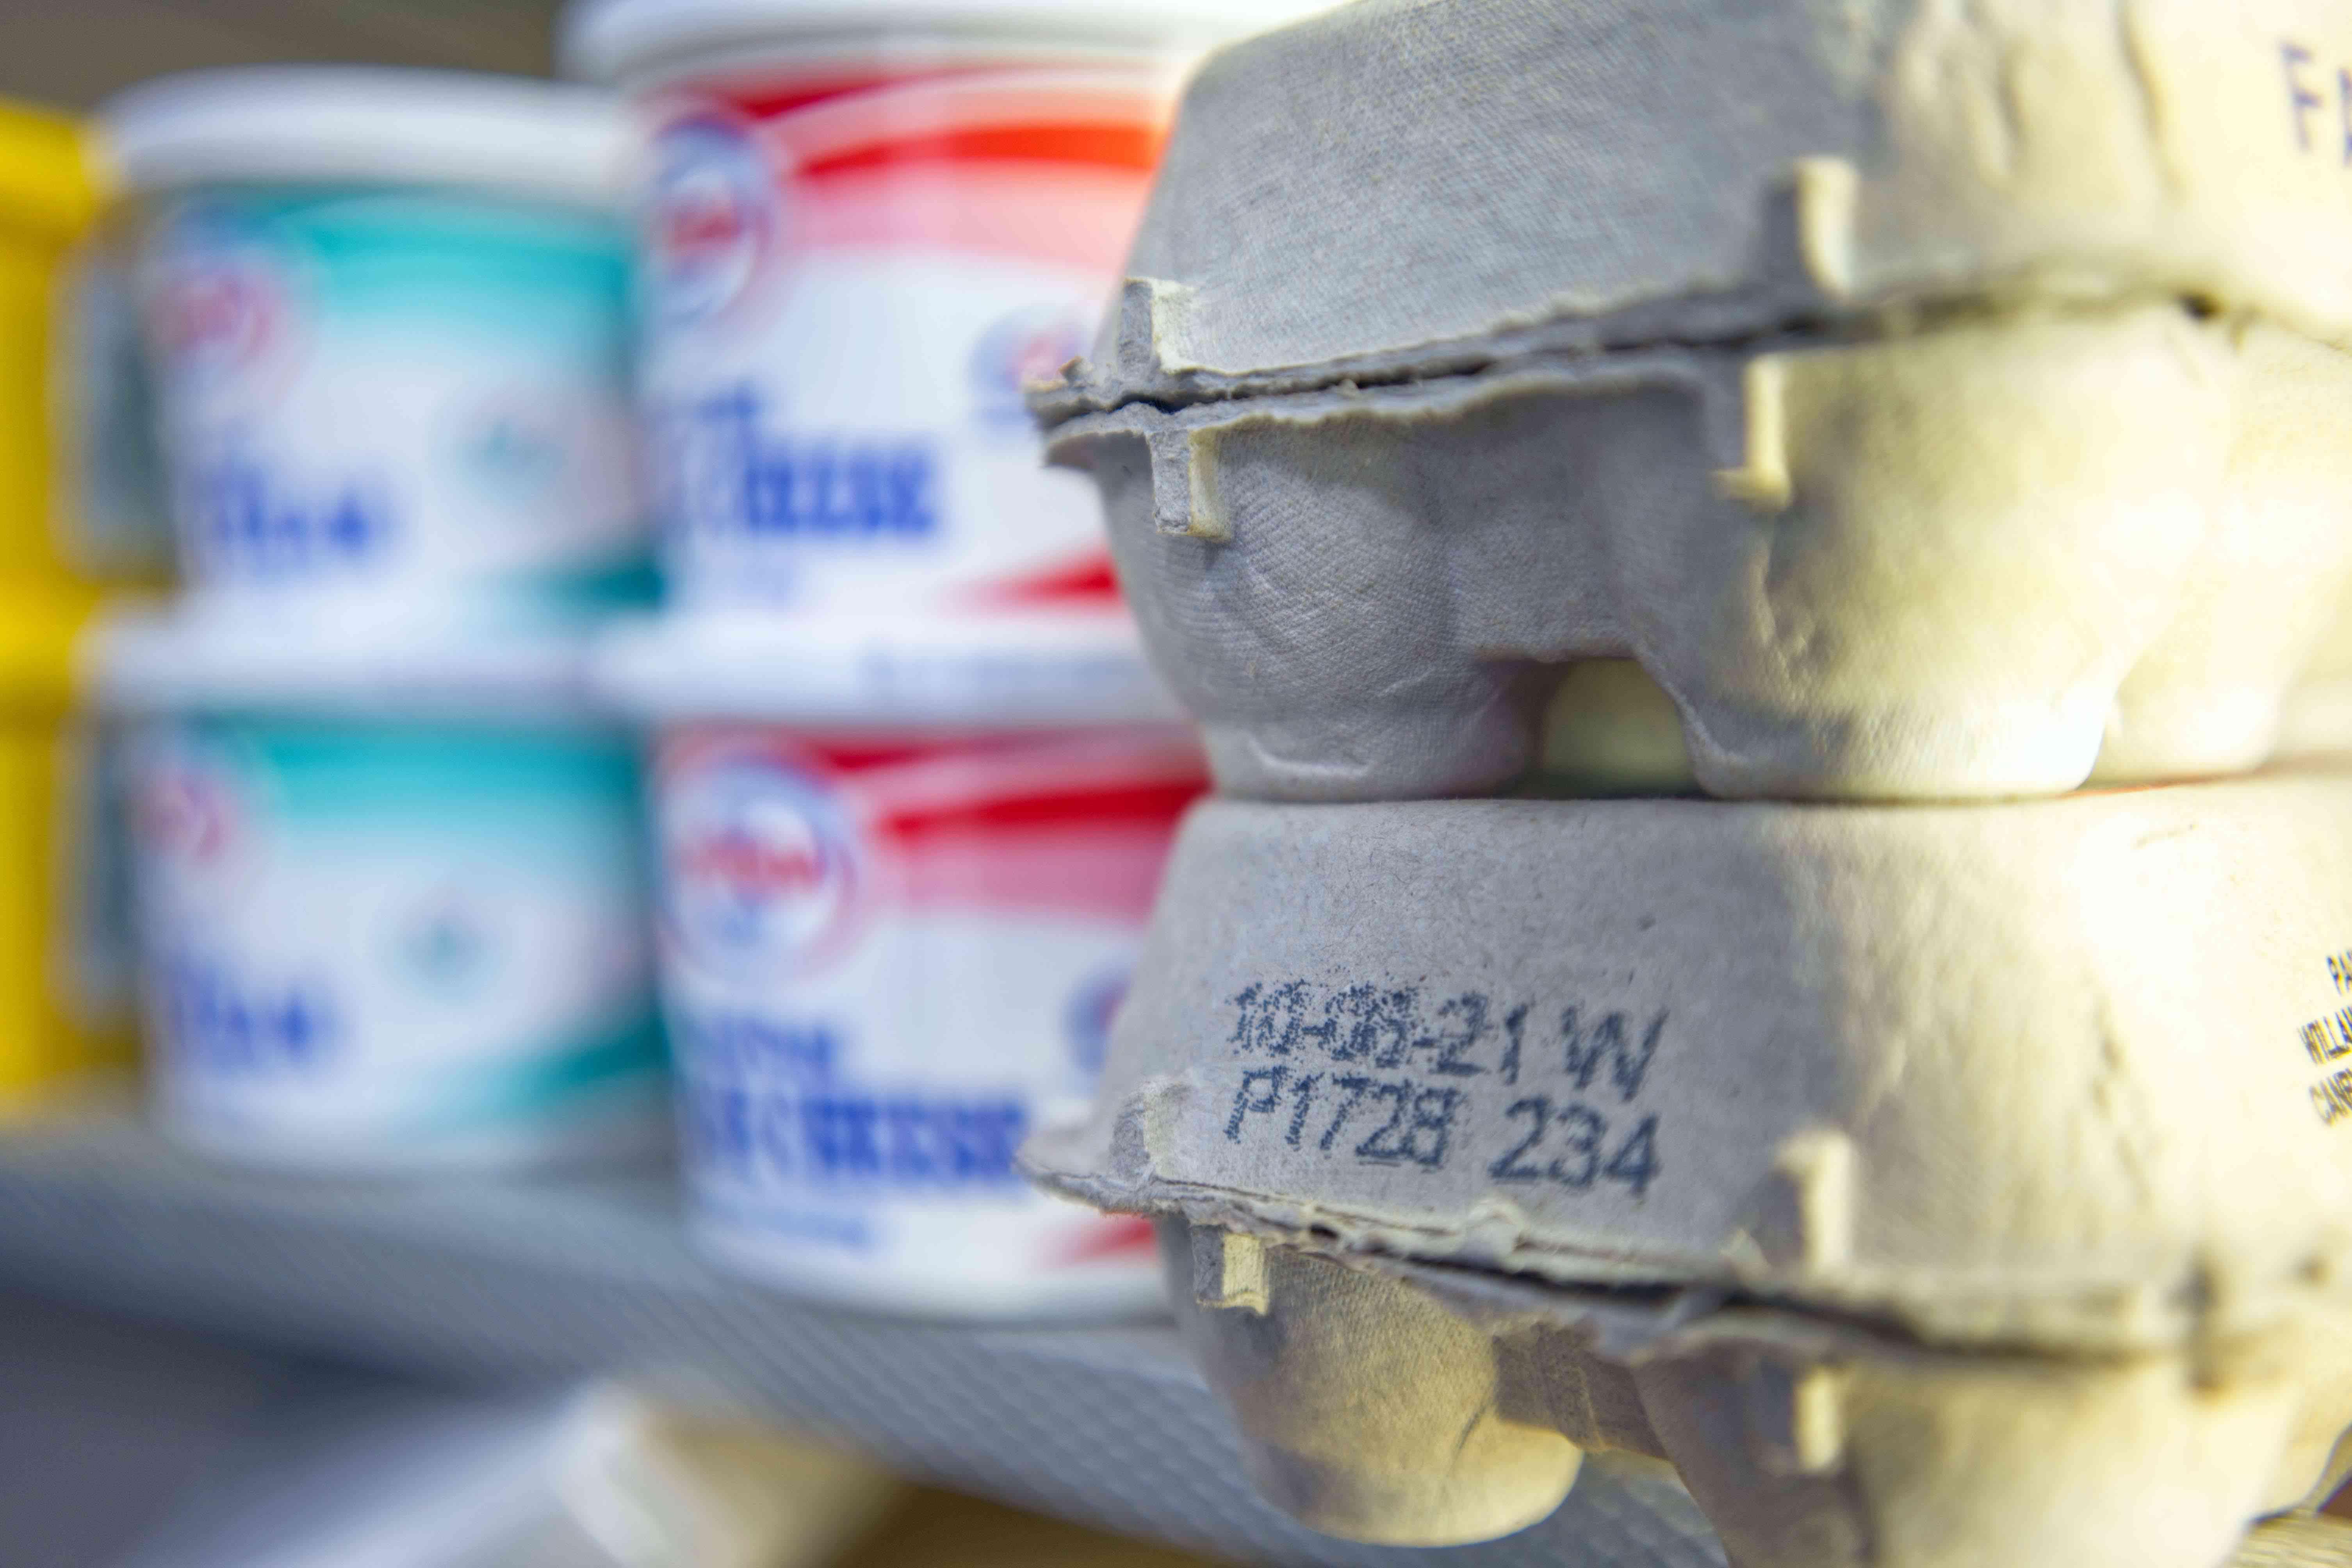 closeup of expiration date on fresh egg carton in fridge